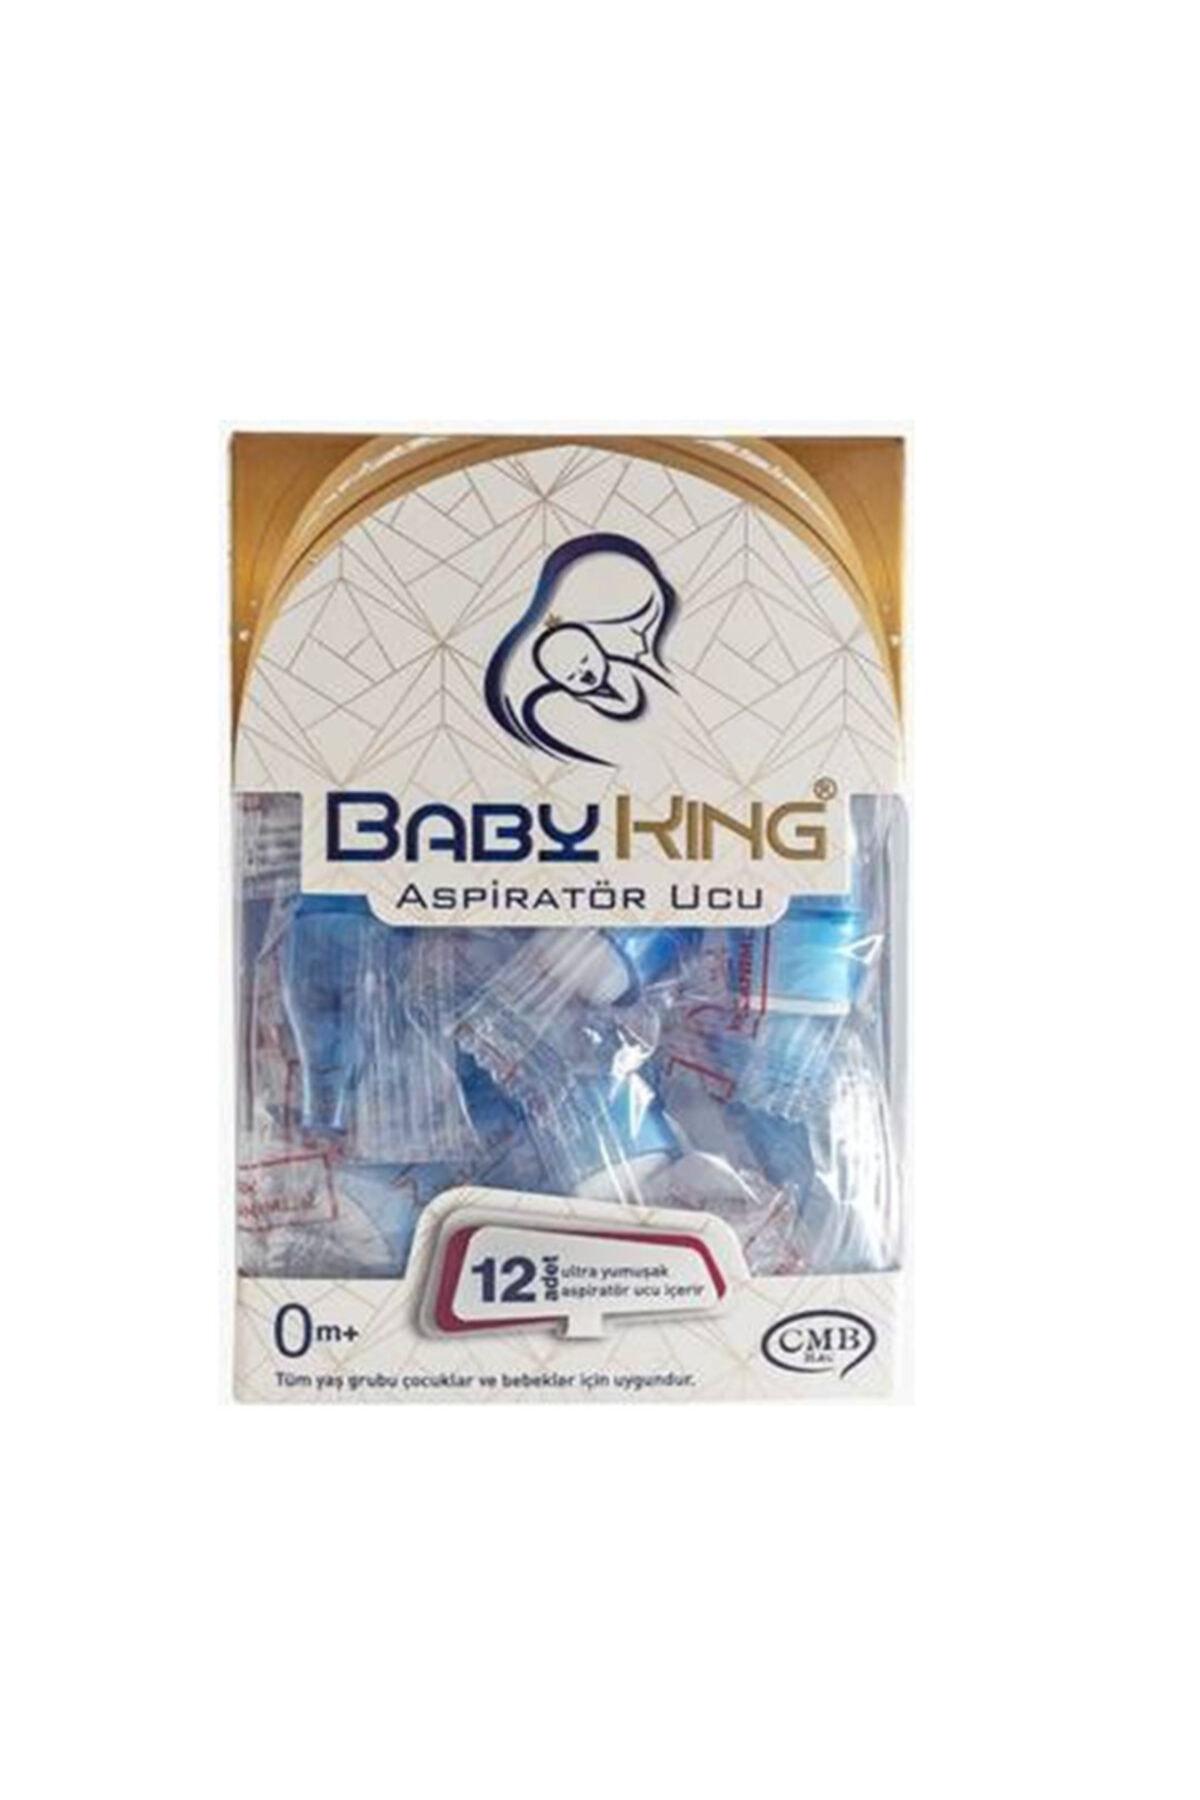 Otribebe Baby King Nazal Burun Aspiratör - Rhinobebe Uyumlu Yedek Uç - Mavi 1